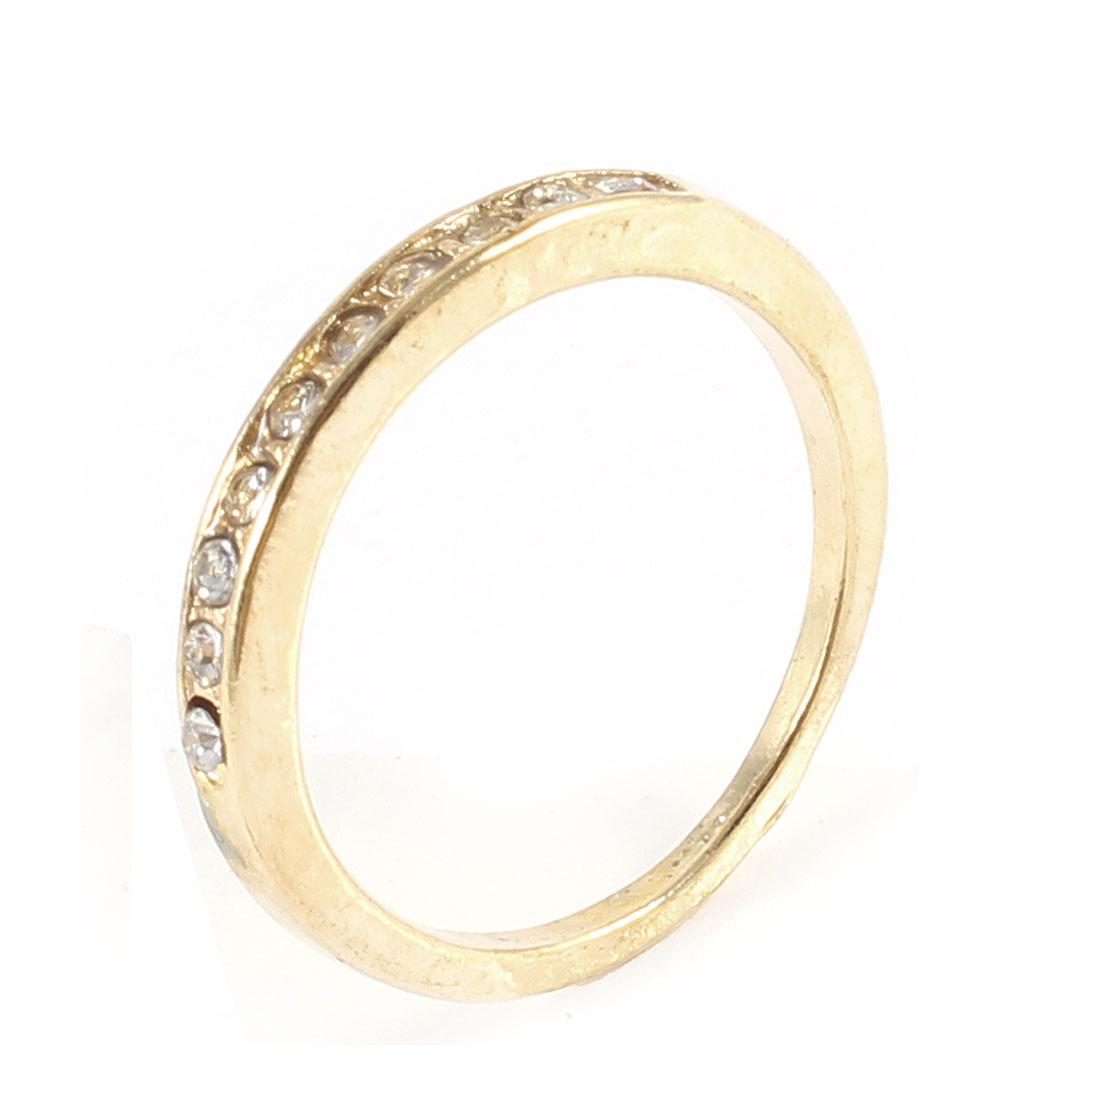 Ladies Gold Tone Metal Glitter Rhinestone Inlaid Finger Ring Decoration